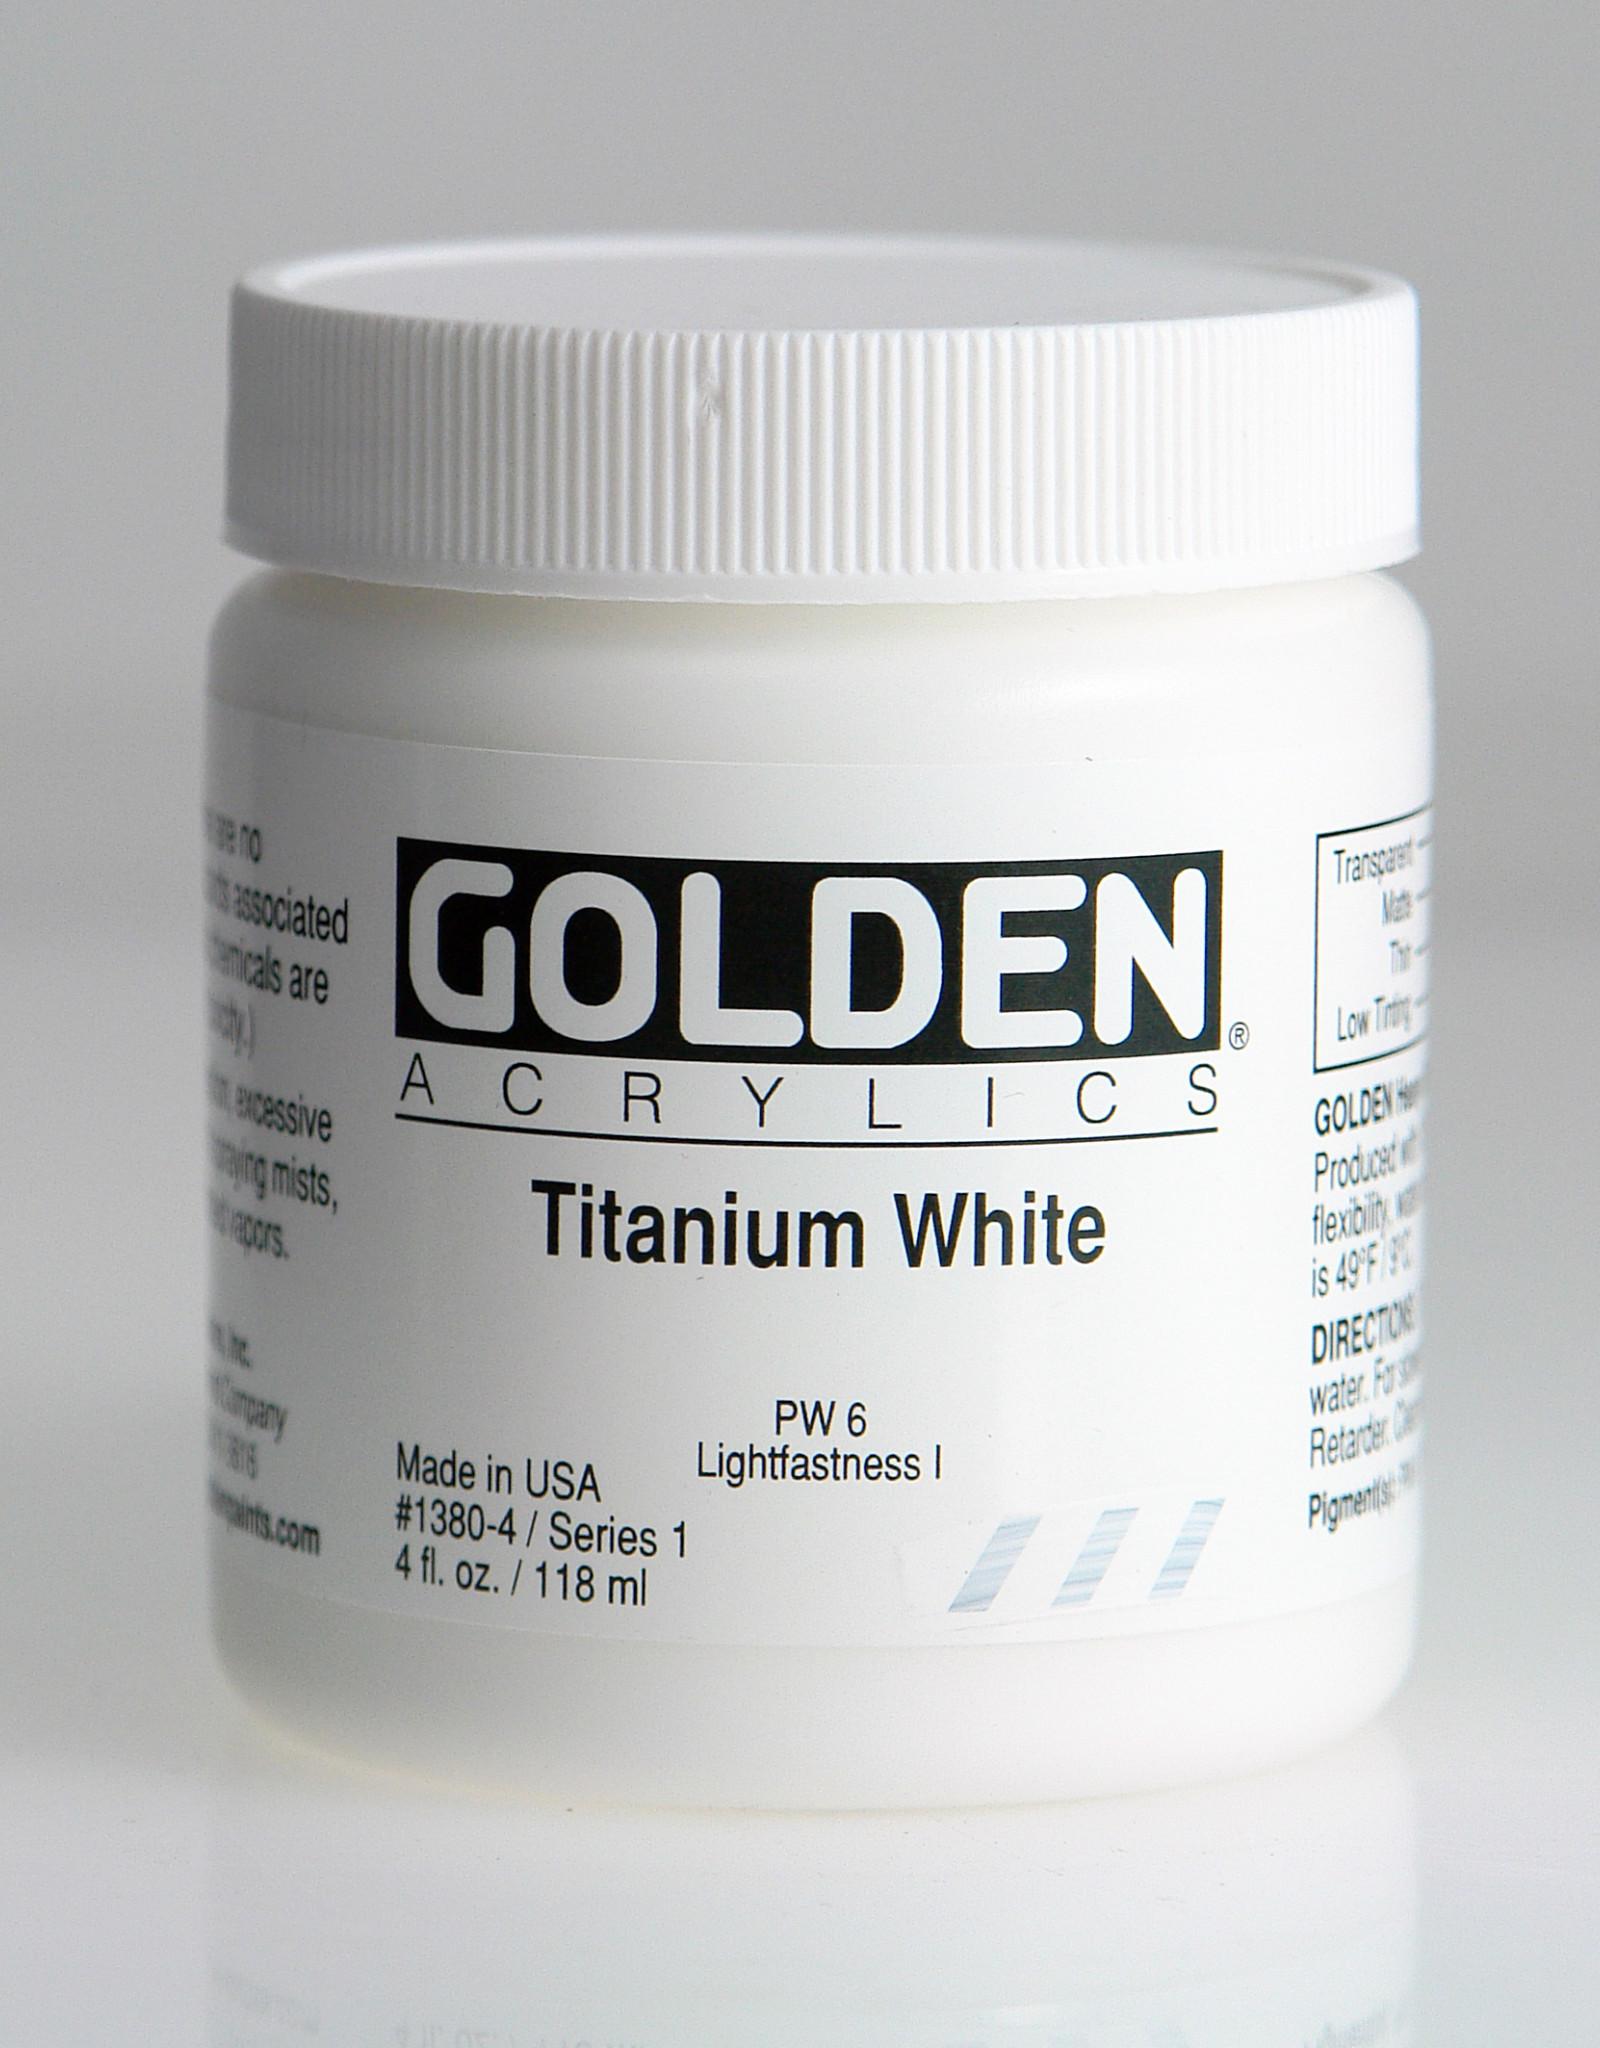 Golden, Heavy Body Acrylic Paint, Titanium White, Series 1, 4fl.oz. Jar